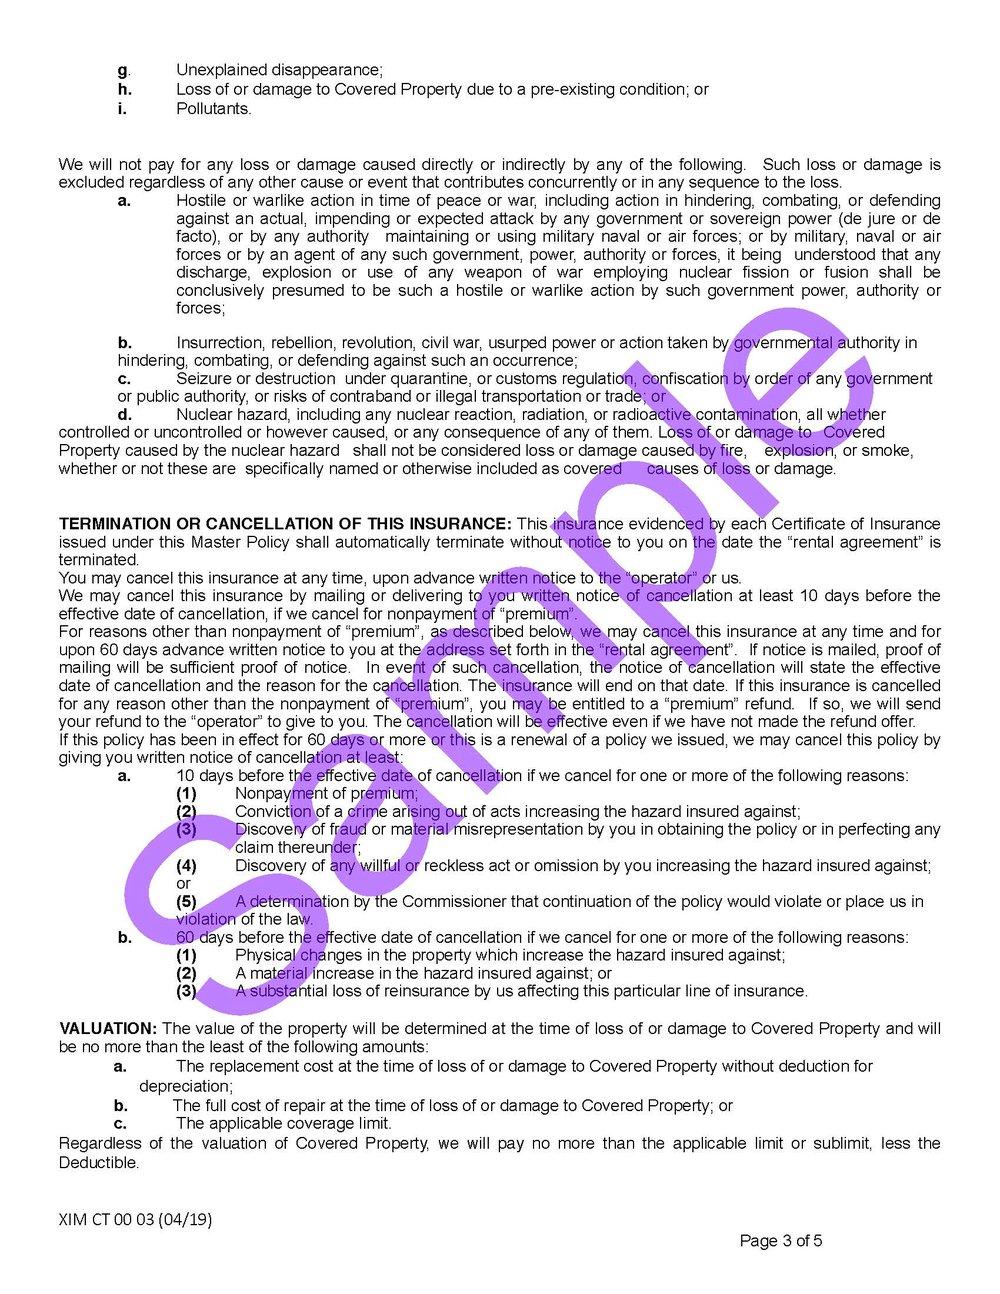 XIM CT 00 03 04 19 Connecticut Certificate of InsuranceSample_Page_3.jpg